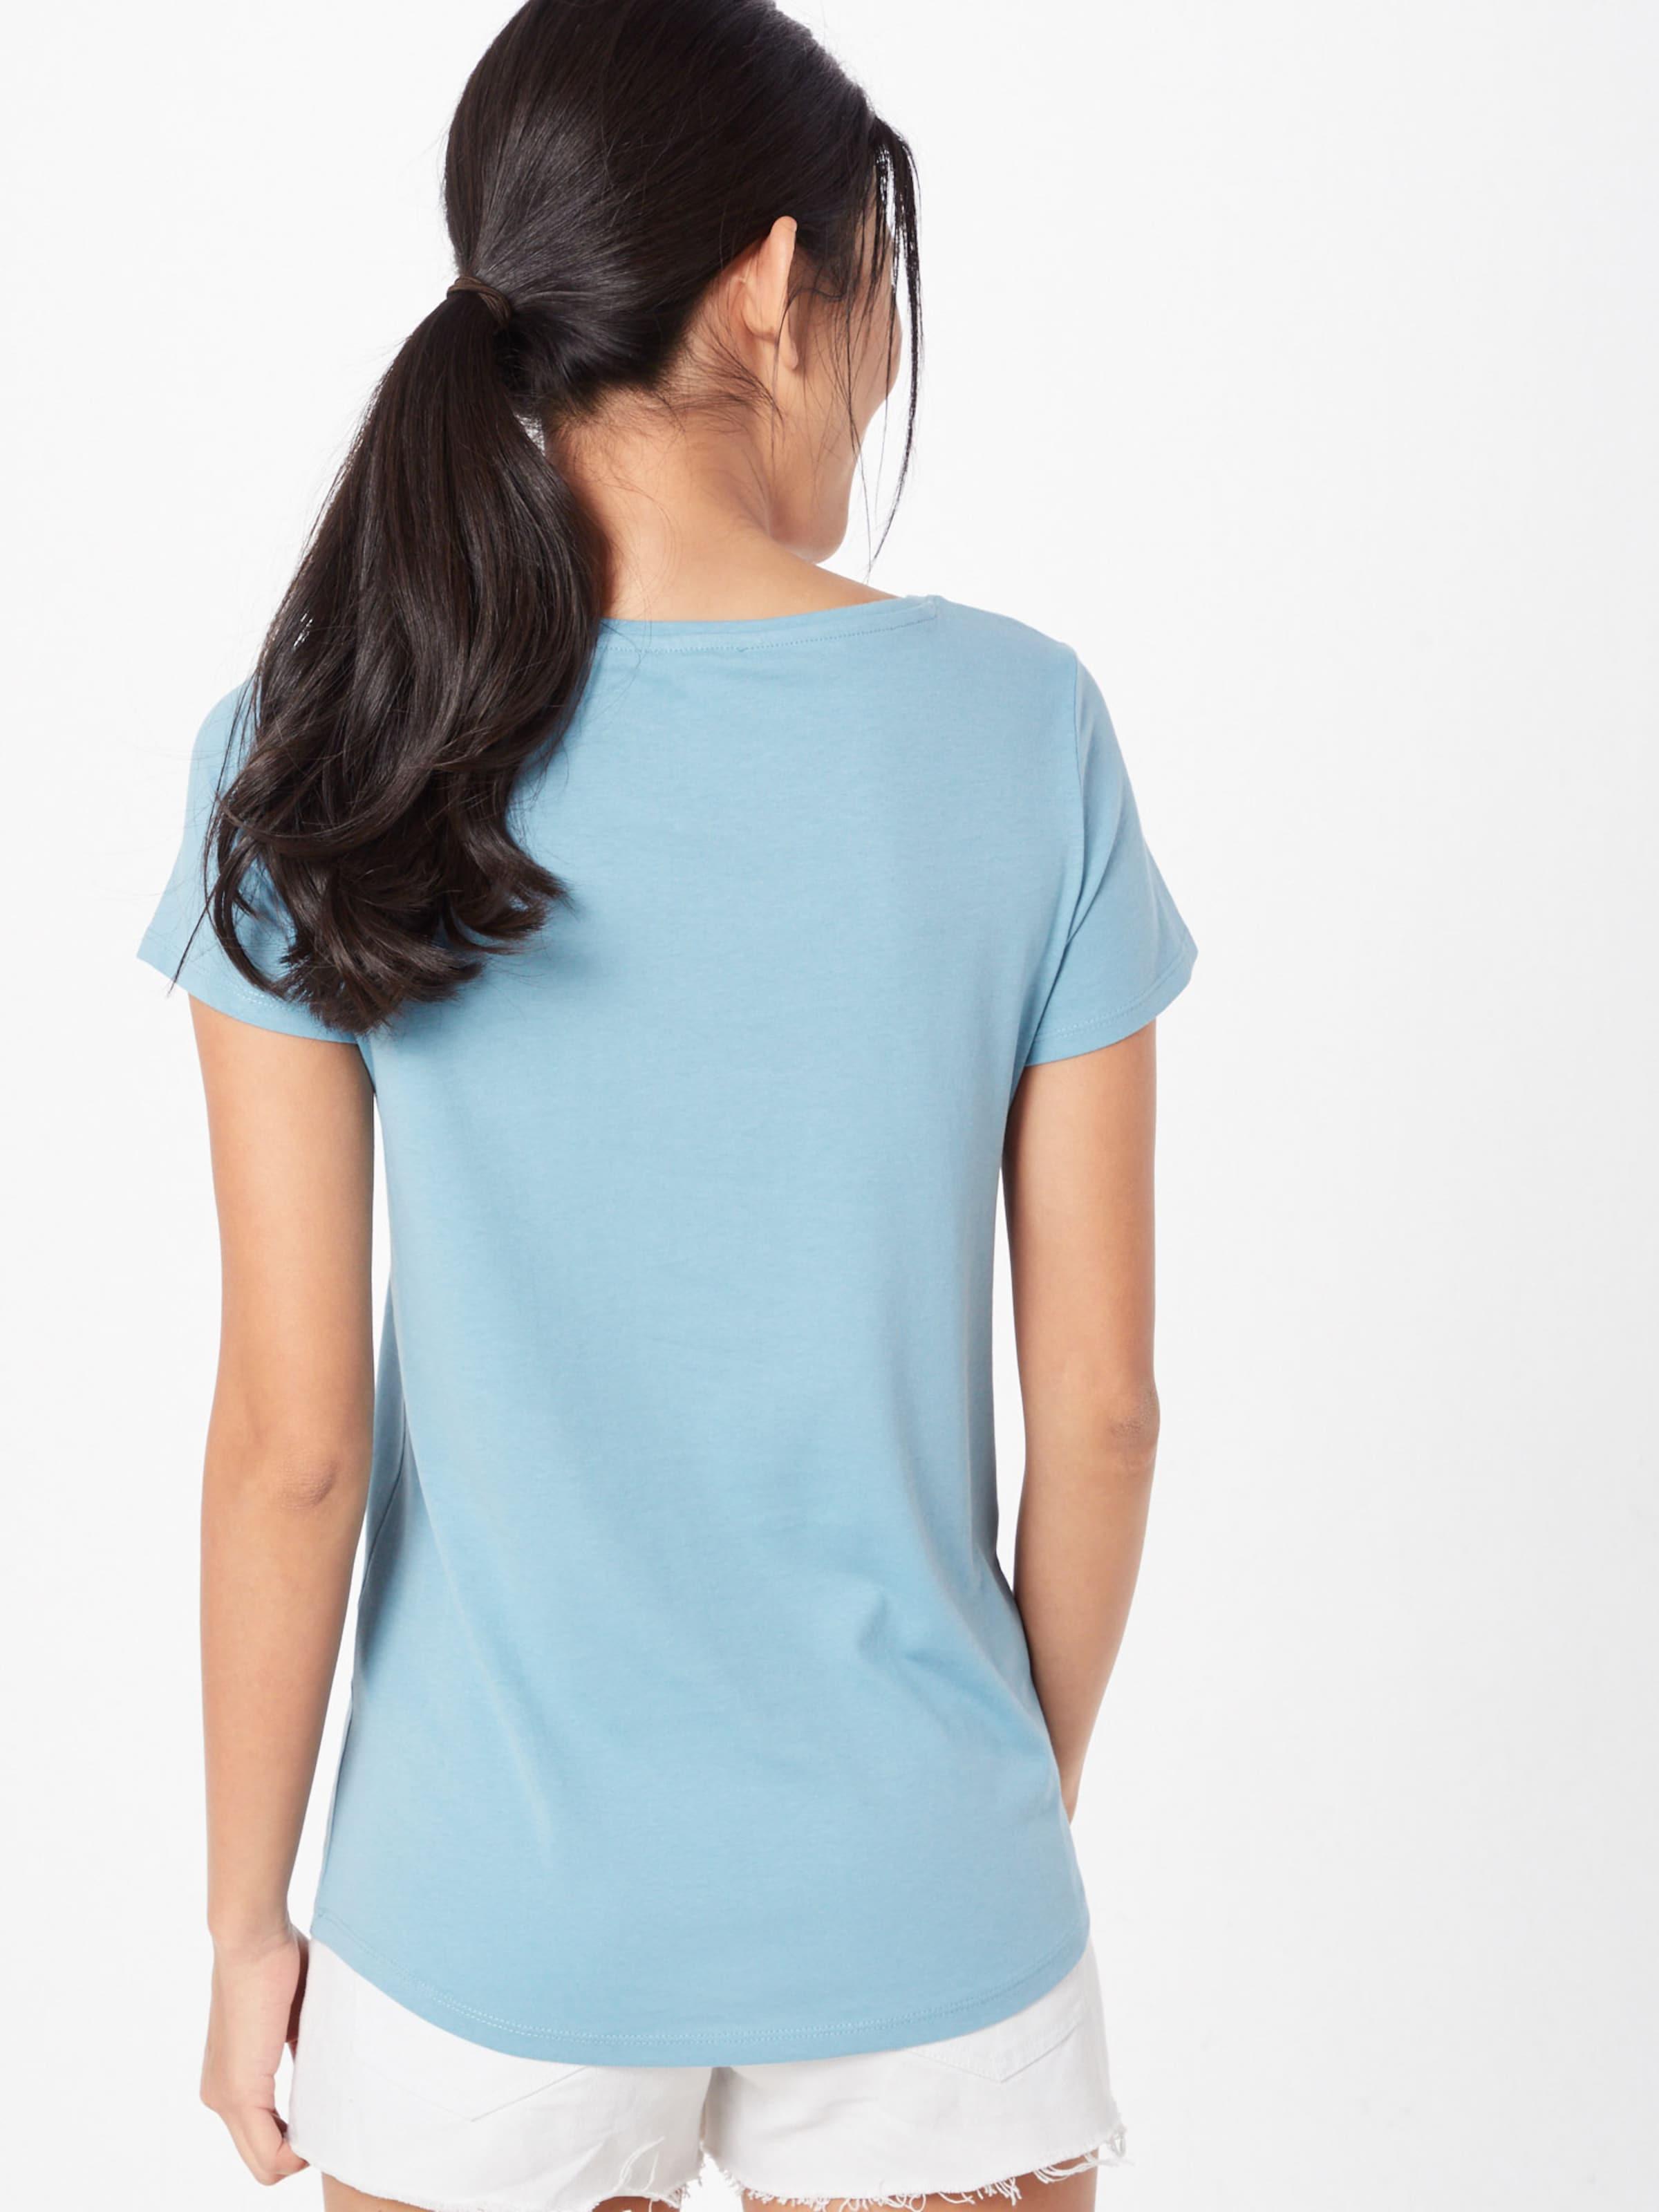 Aw Esprit In Shirt Style' 'whs Hellblau CxoBed